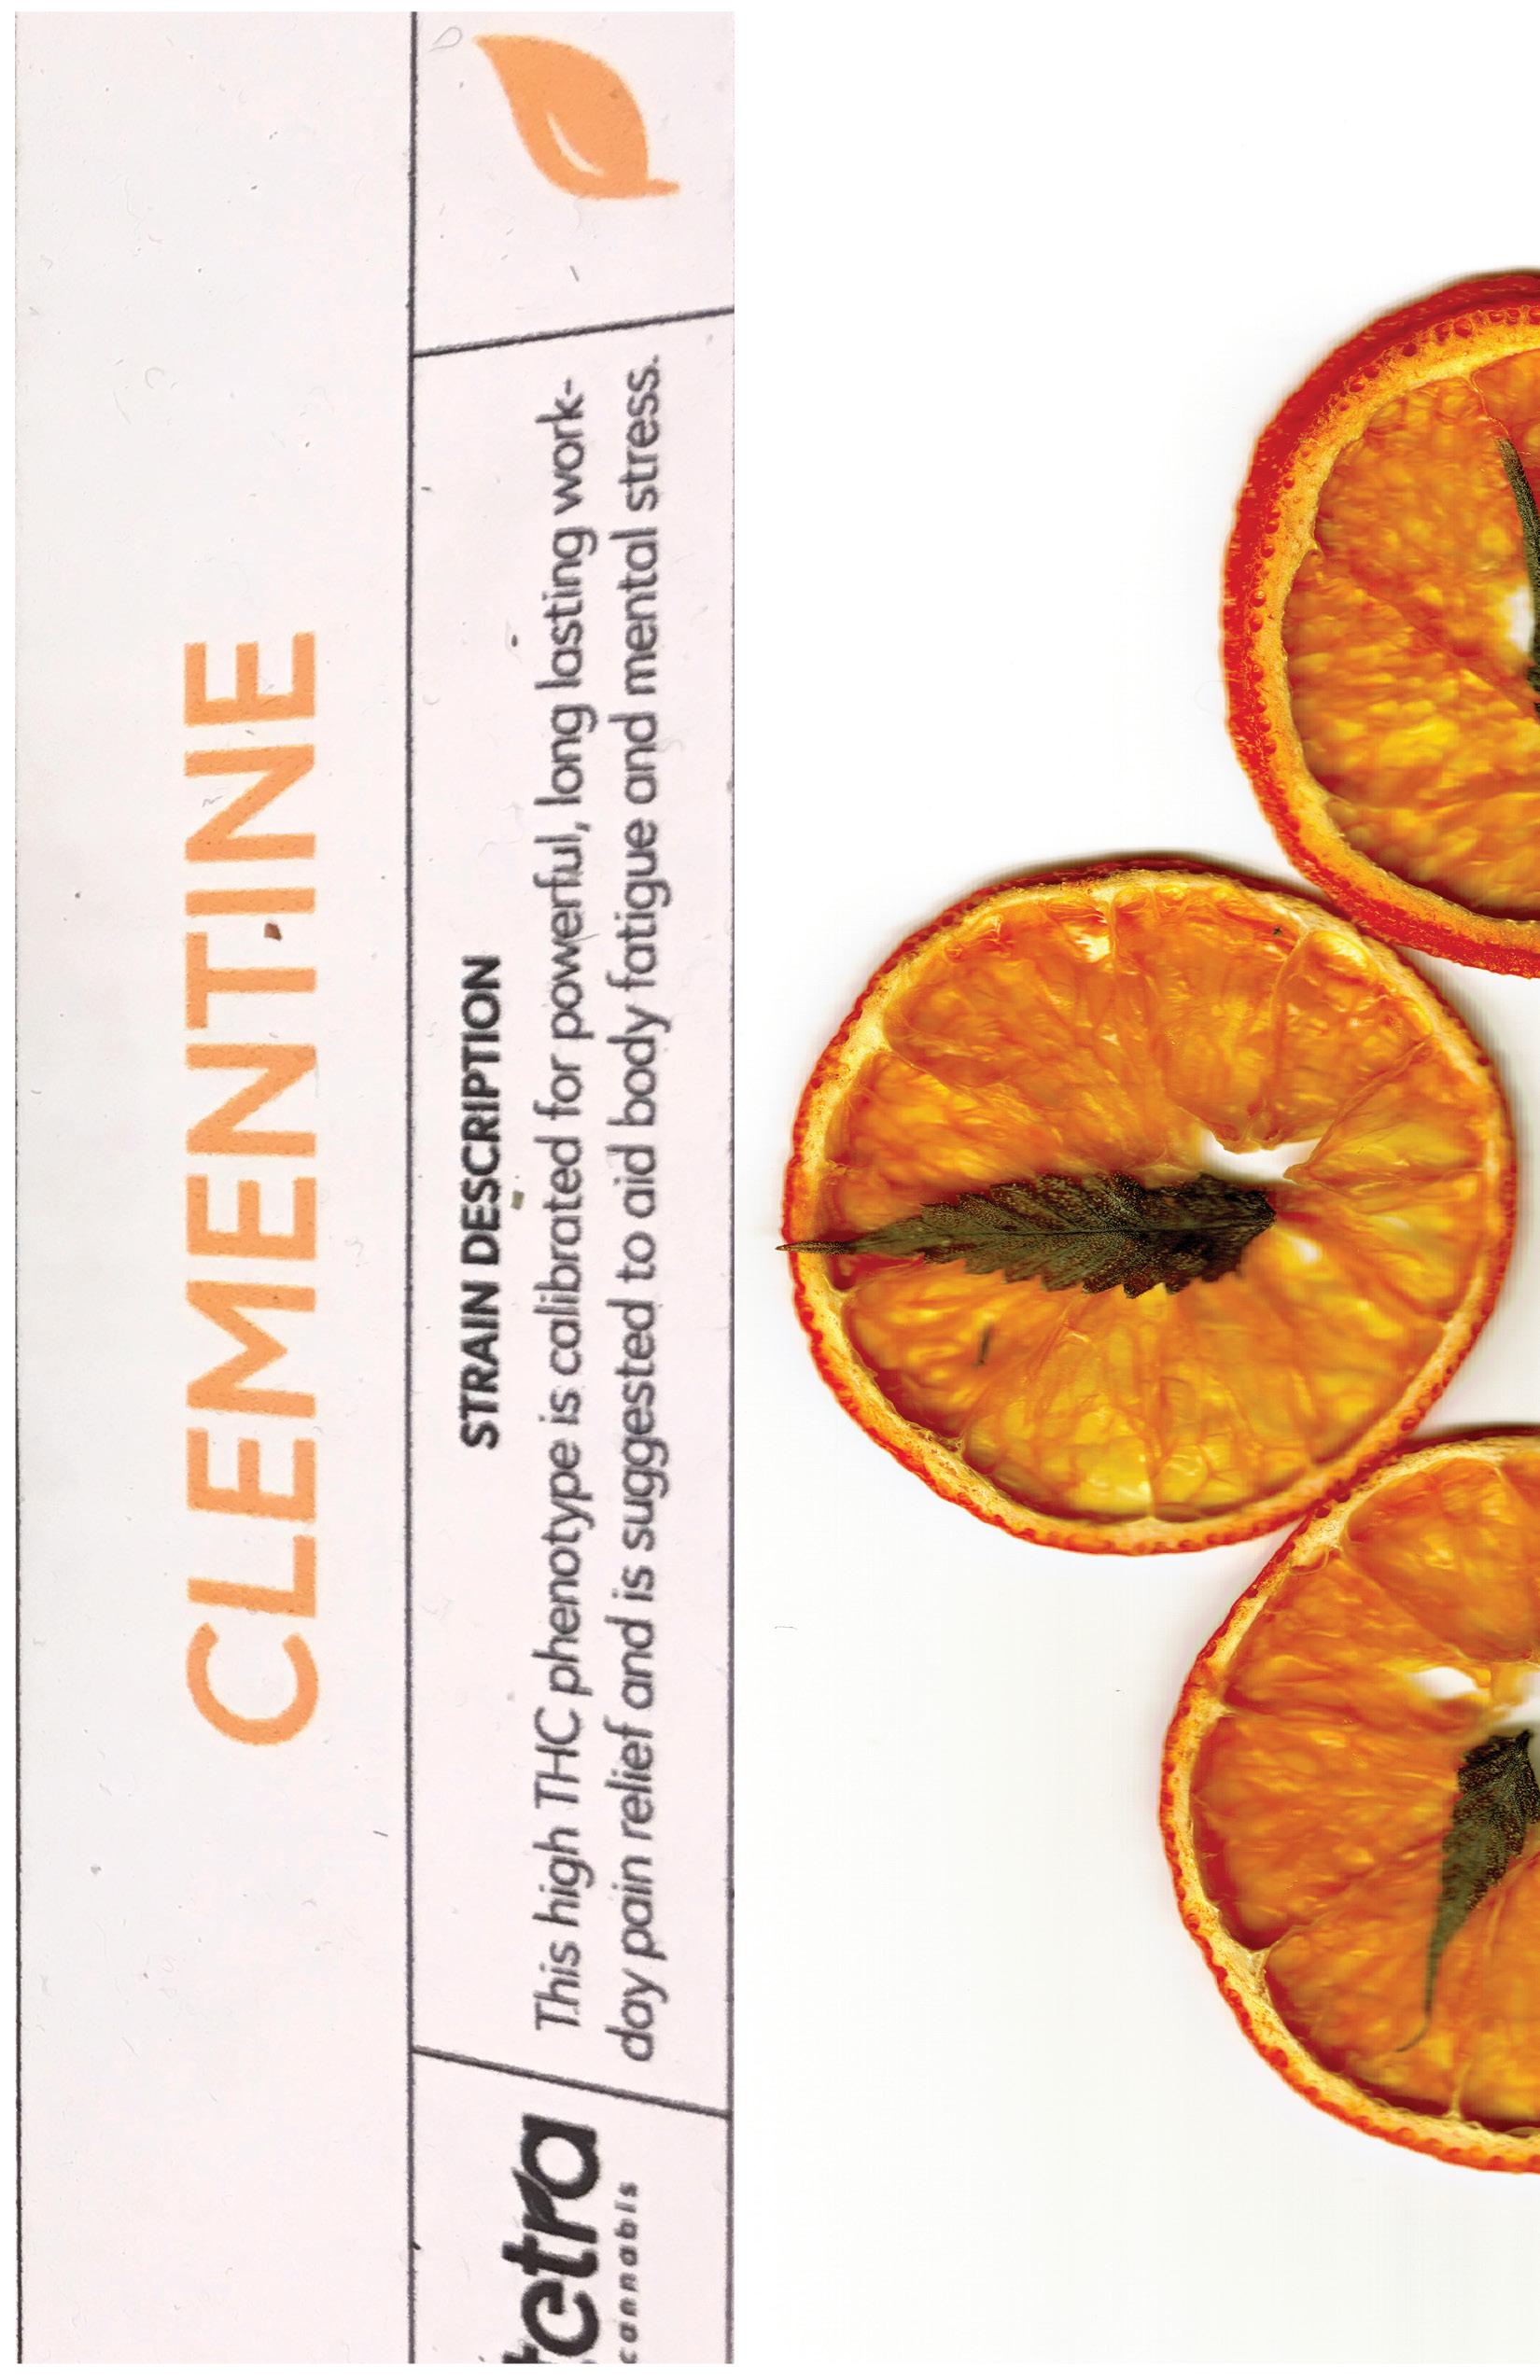 Cheechable_Clementine Gallery10.jpg